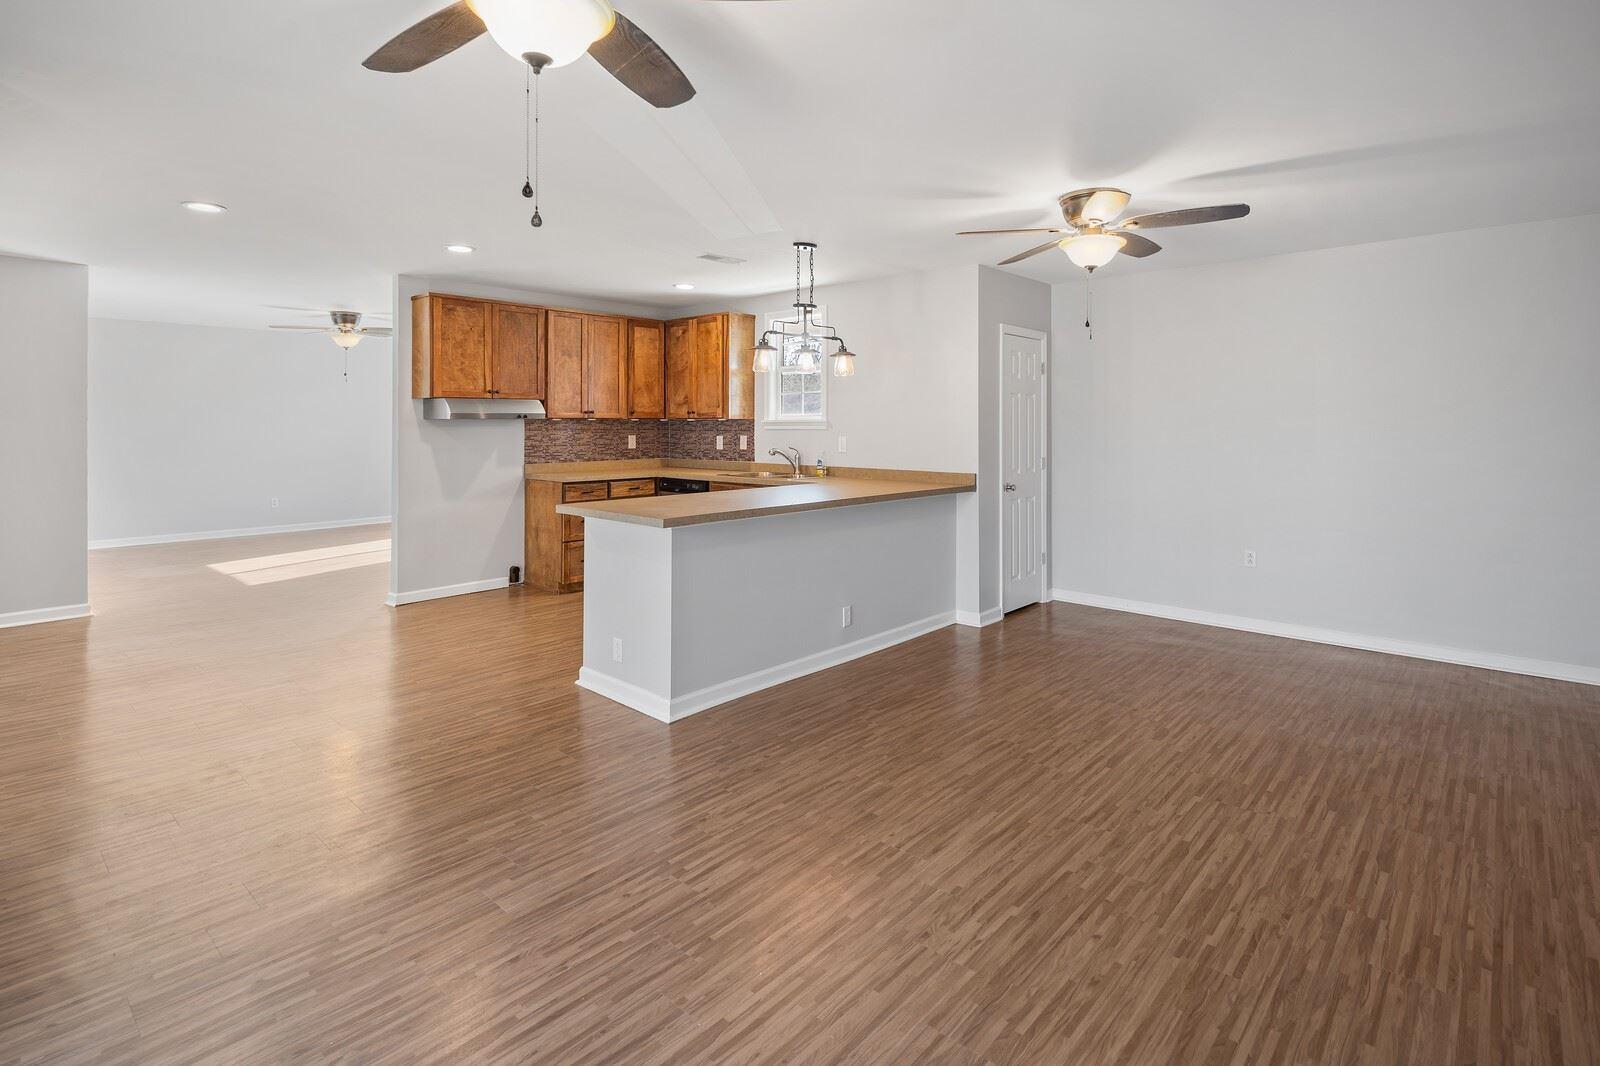 209 Manzano Rd, Madison, TN 37115 - MLS#: 2208663